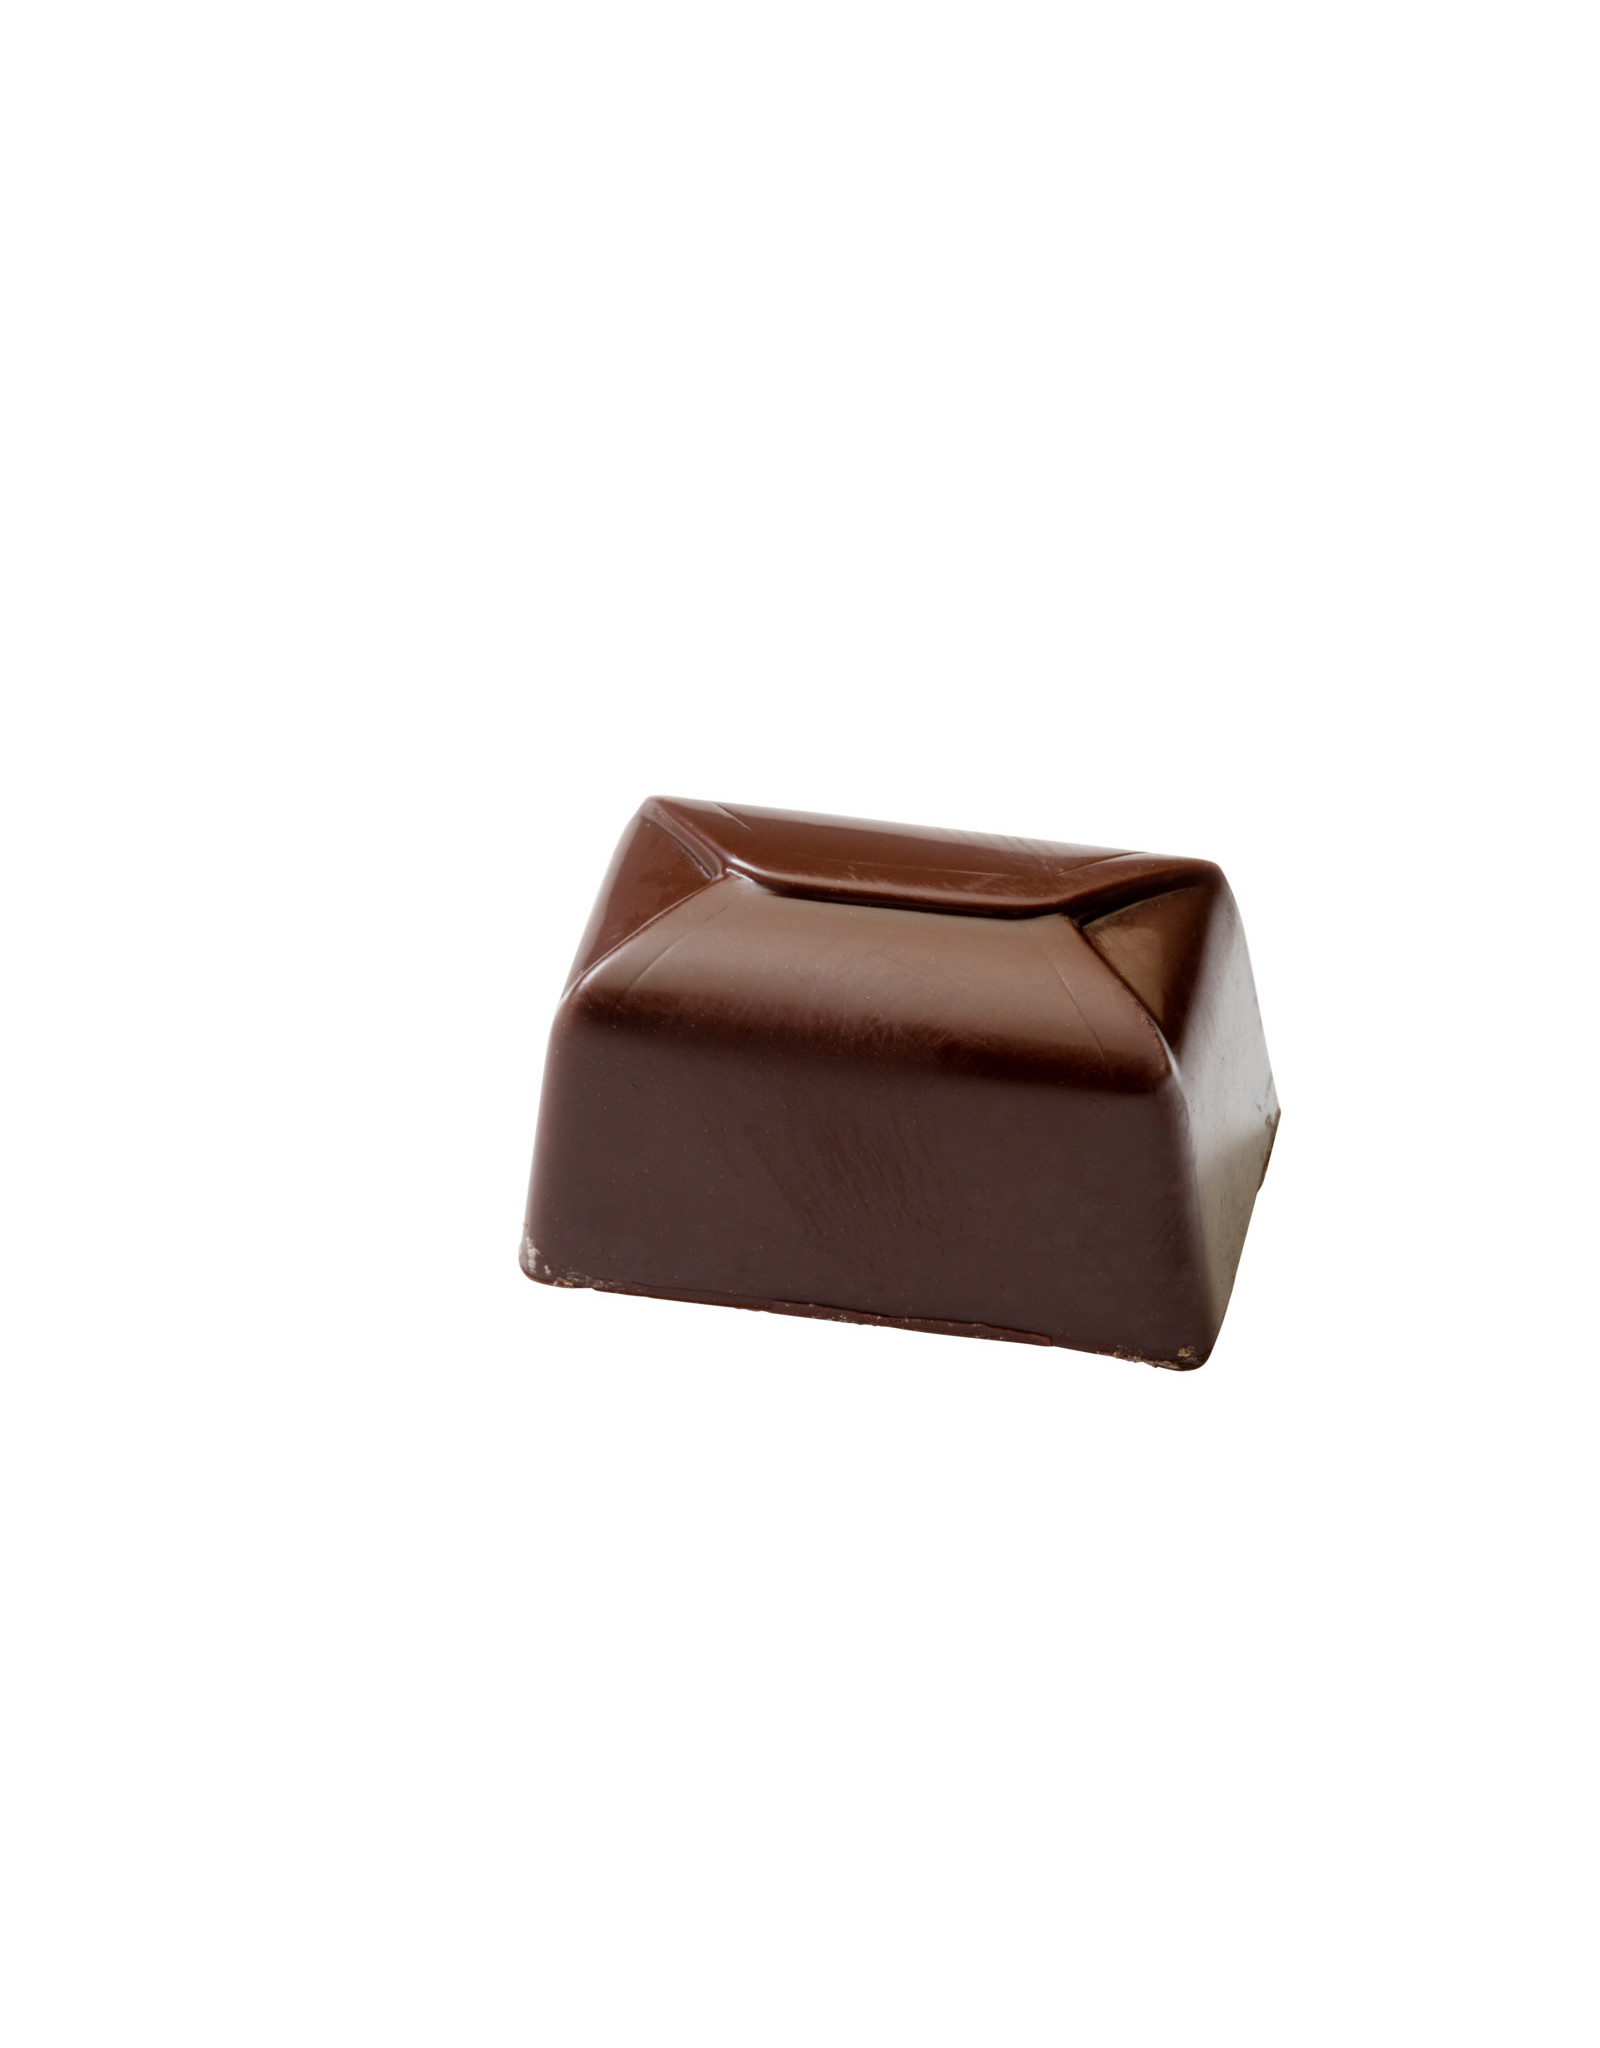 Visser Chocolade Advocaat